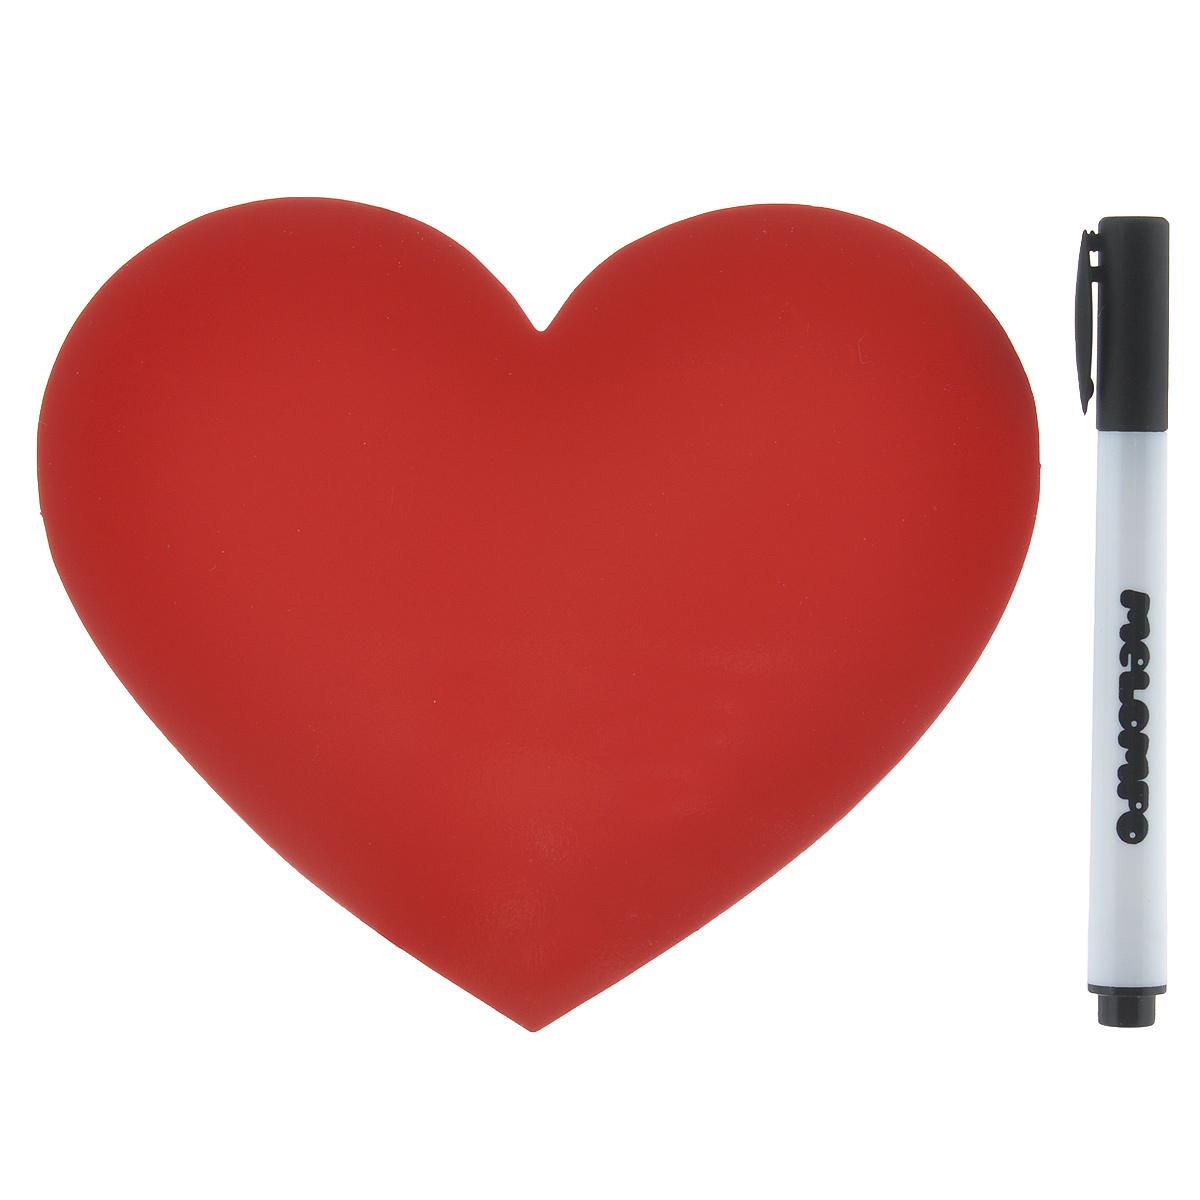 Памятка маркерная Melompo Сердце, 12 х 10 см доска магнитная на холодильник melompo heart mini